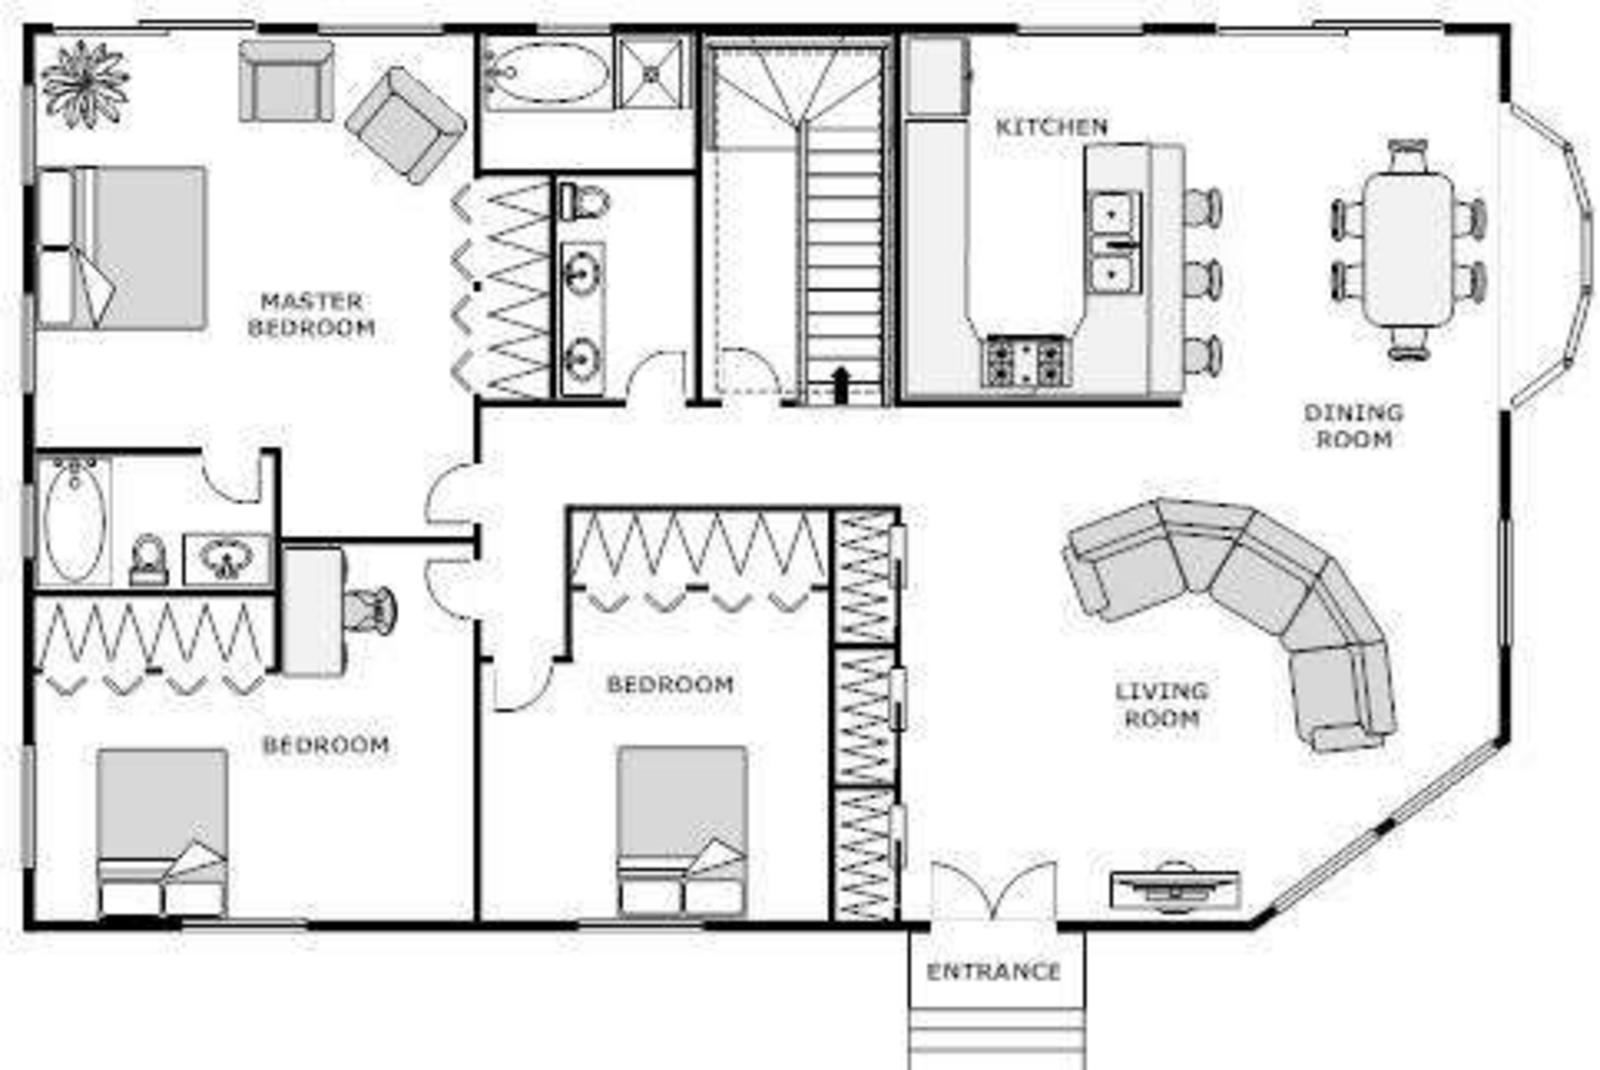 floor-plan1.jpg